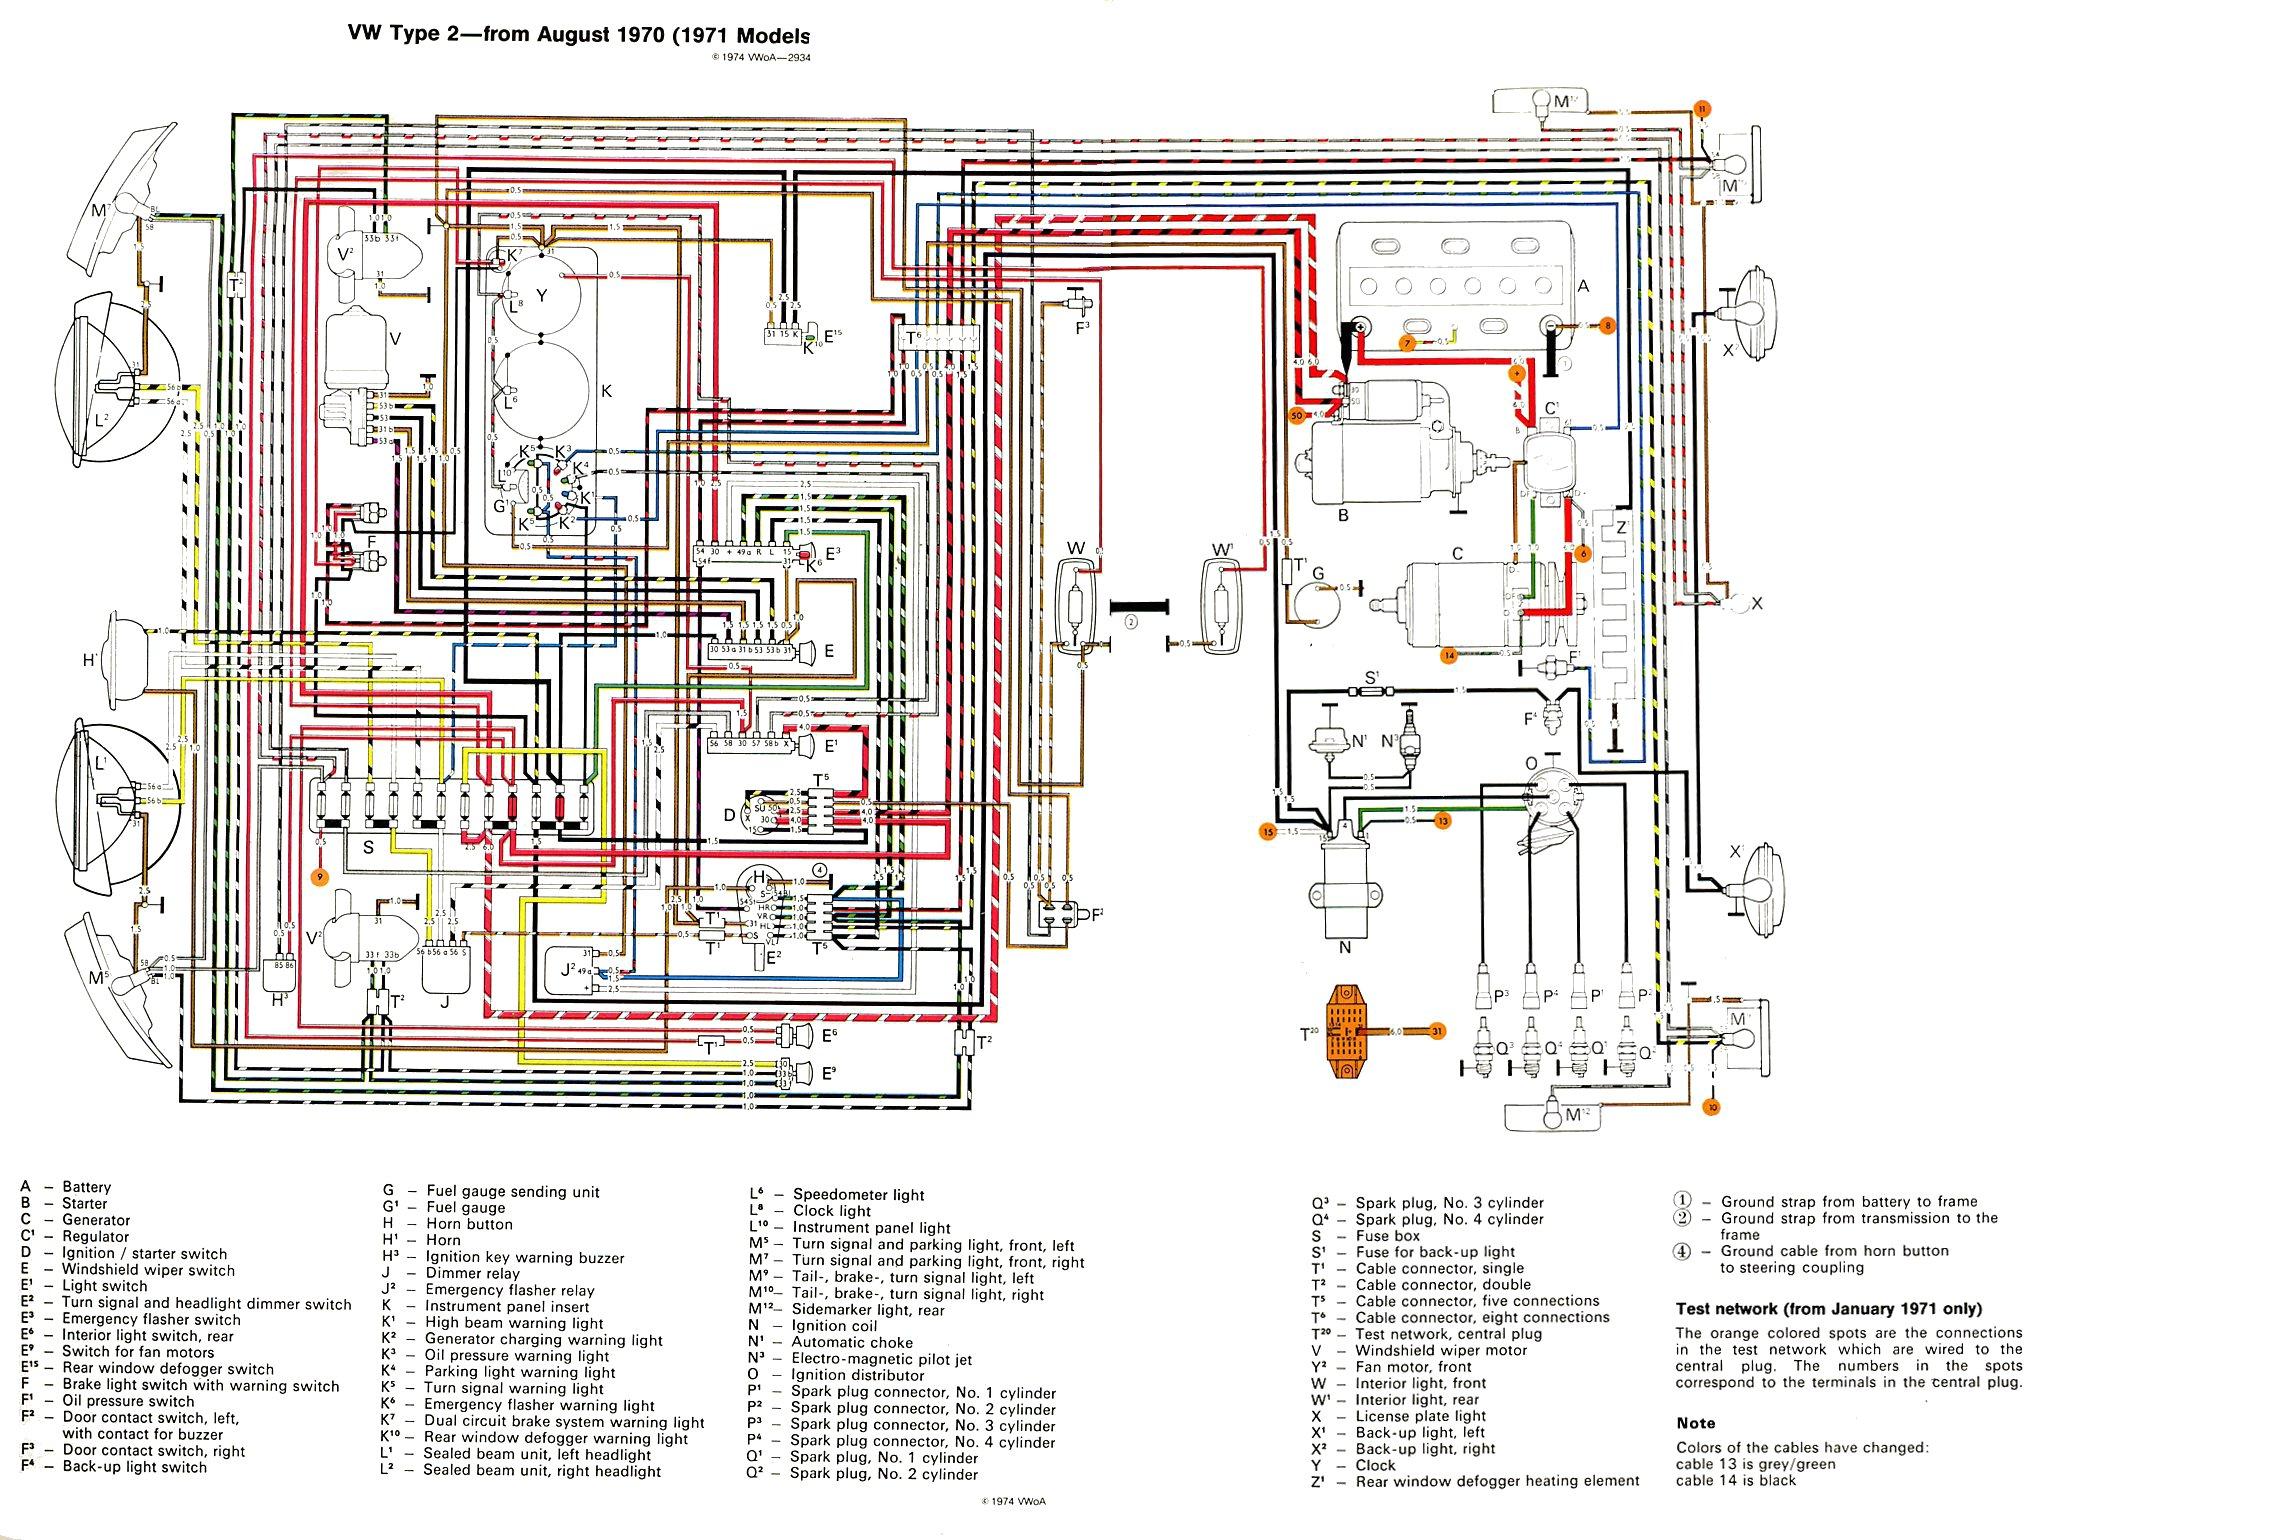 1978 vw wiring diagram wiring diagram page 78 vw engine diagrams [ 2296 x 1540 Pixel ]